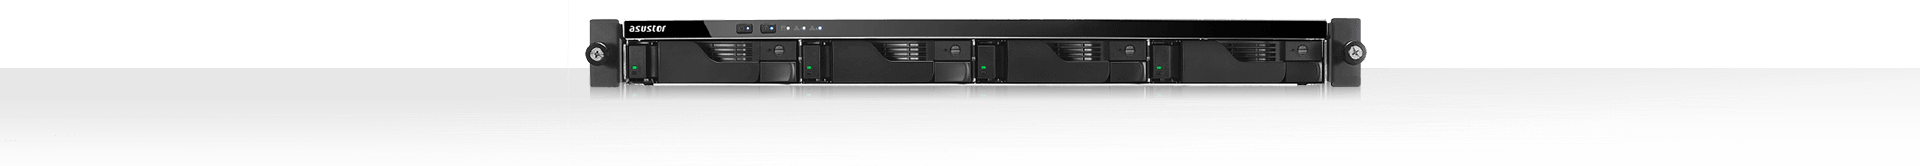 network attached storage 1u rack, 4-bay, asustor as6204rs + railkit 19